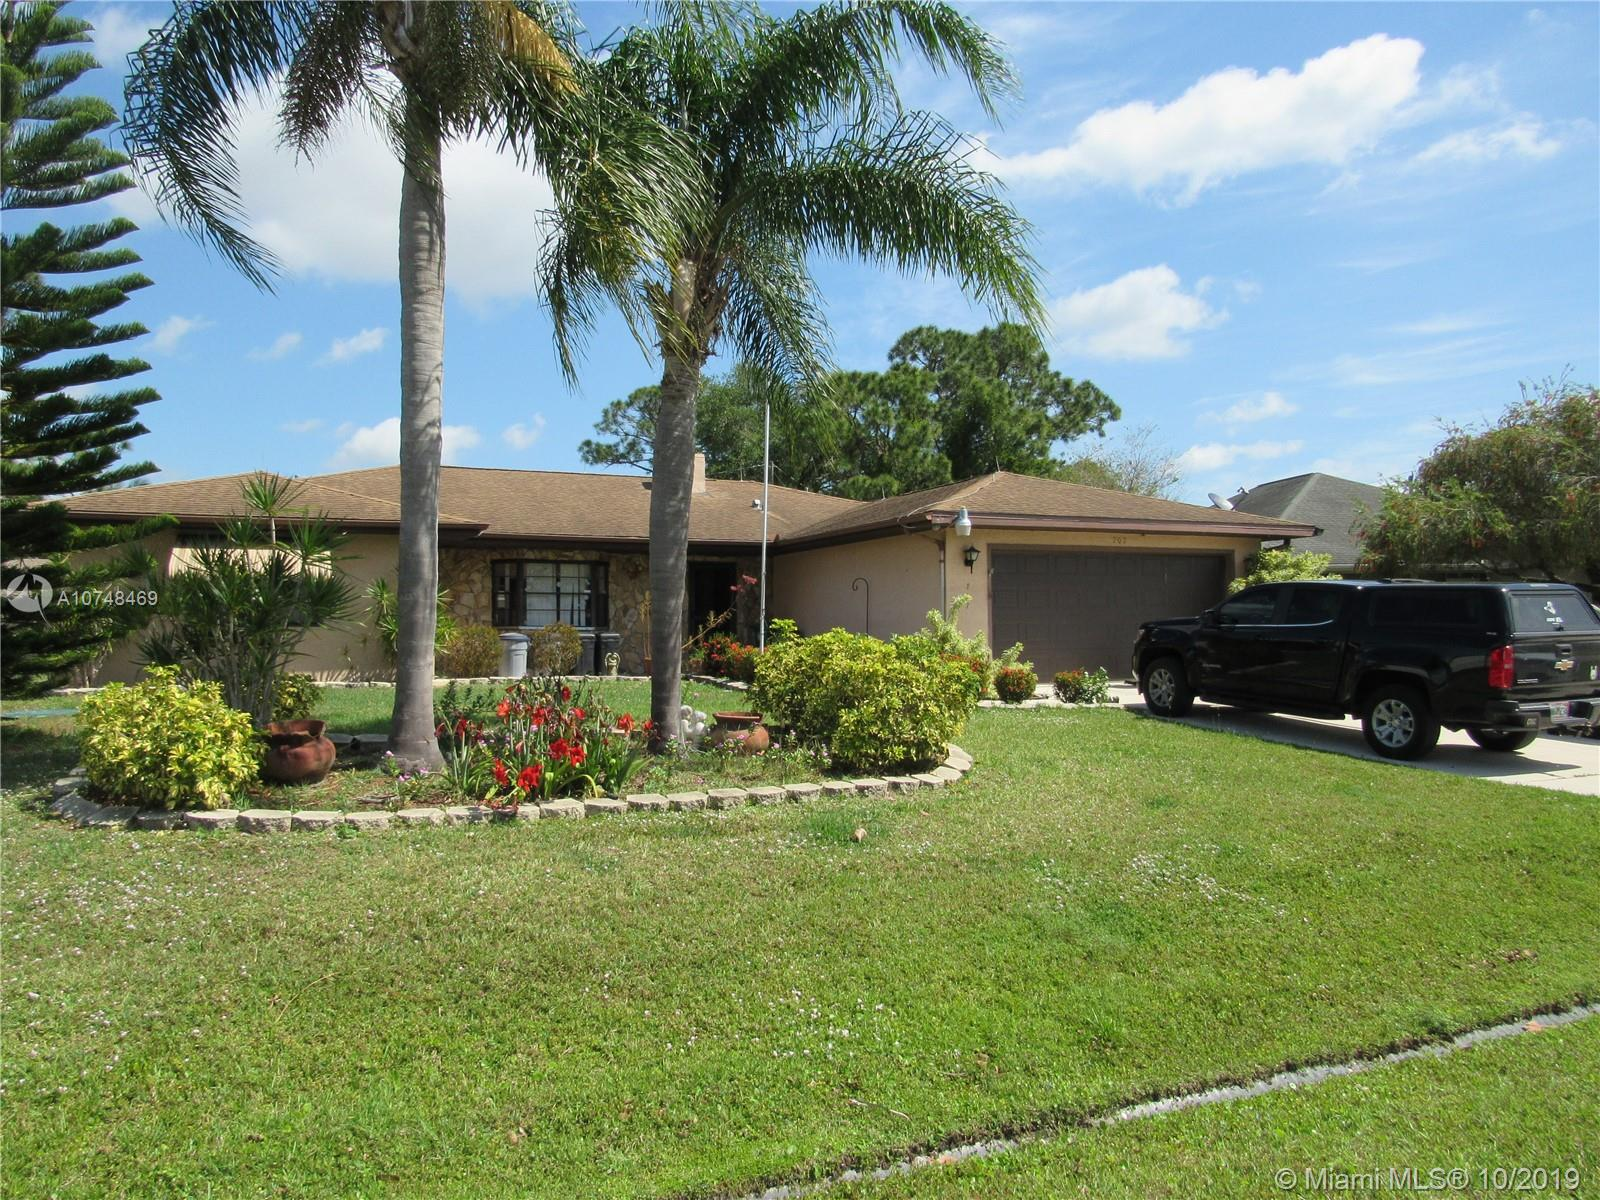 707 NW Bayard Ave, Port St. Lucie, FL 34983